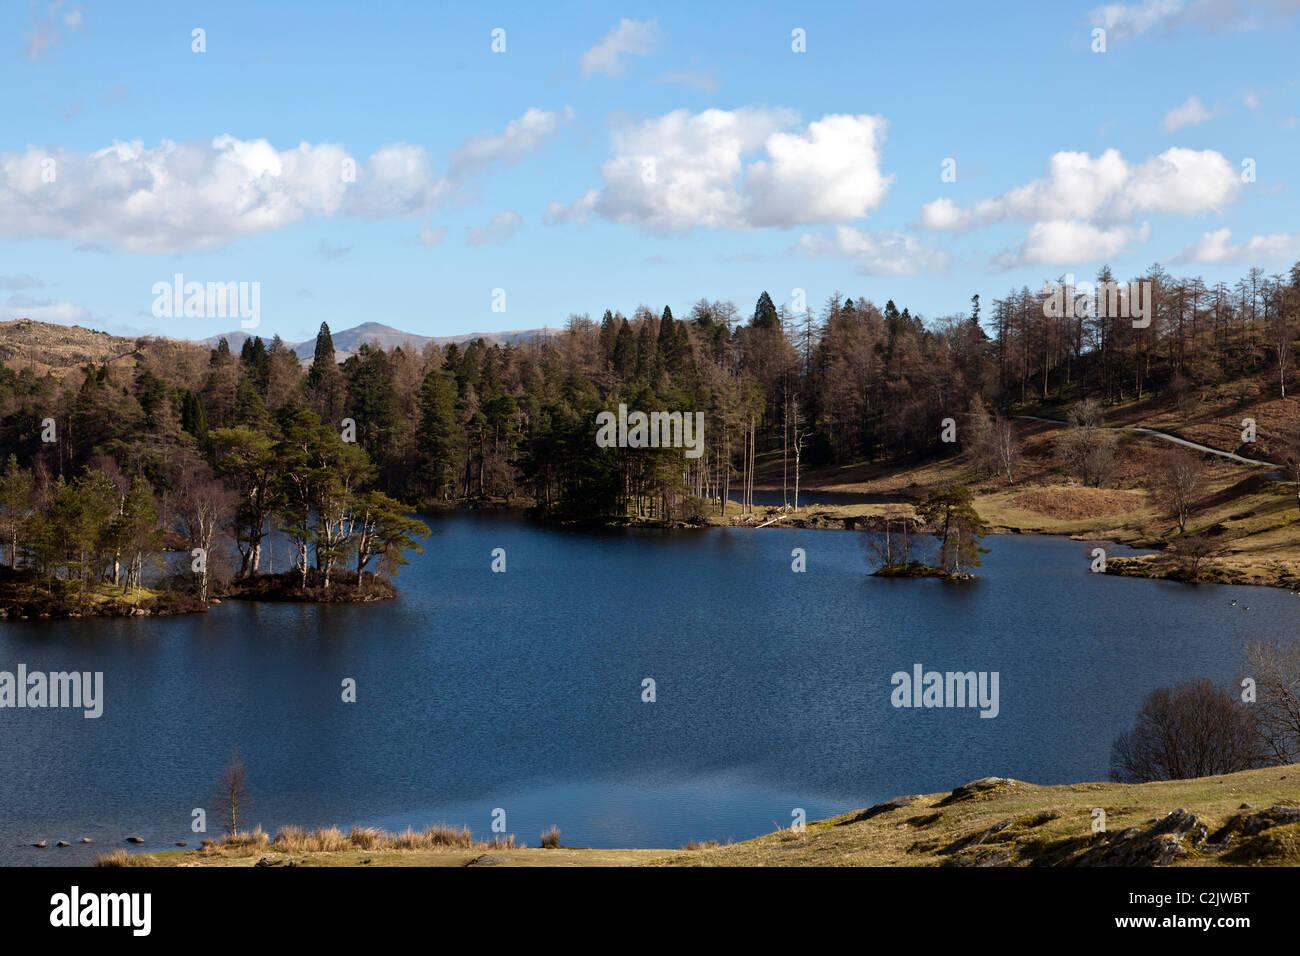 Tarn Hows, Lake District National Park, Cumbria, England, UK. - Stock Image